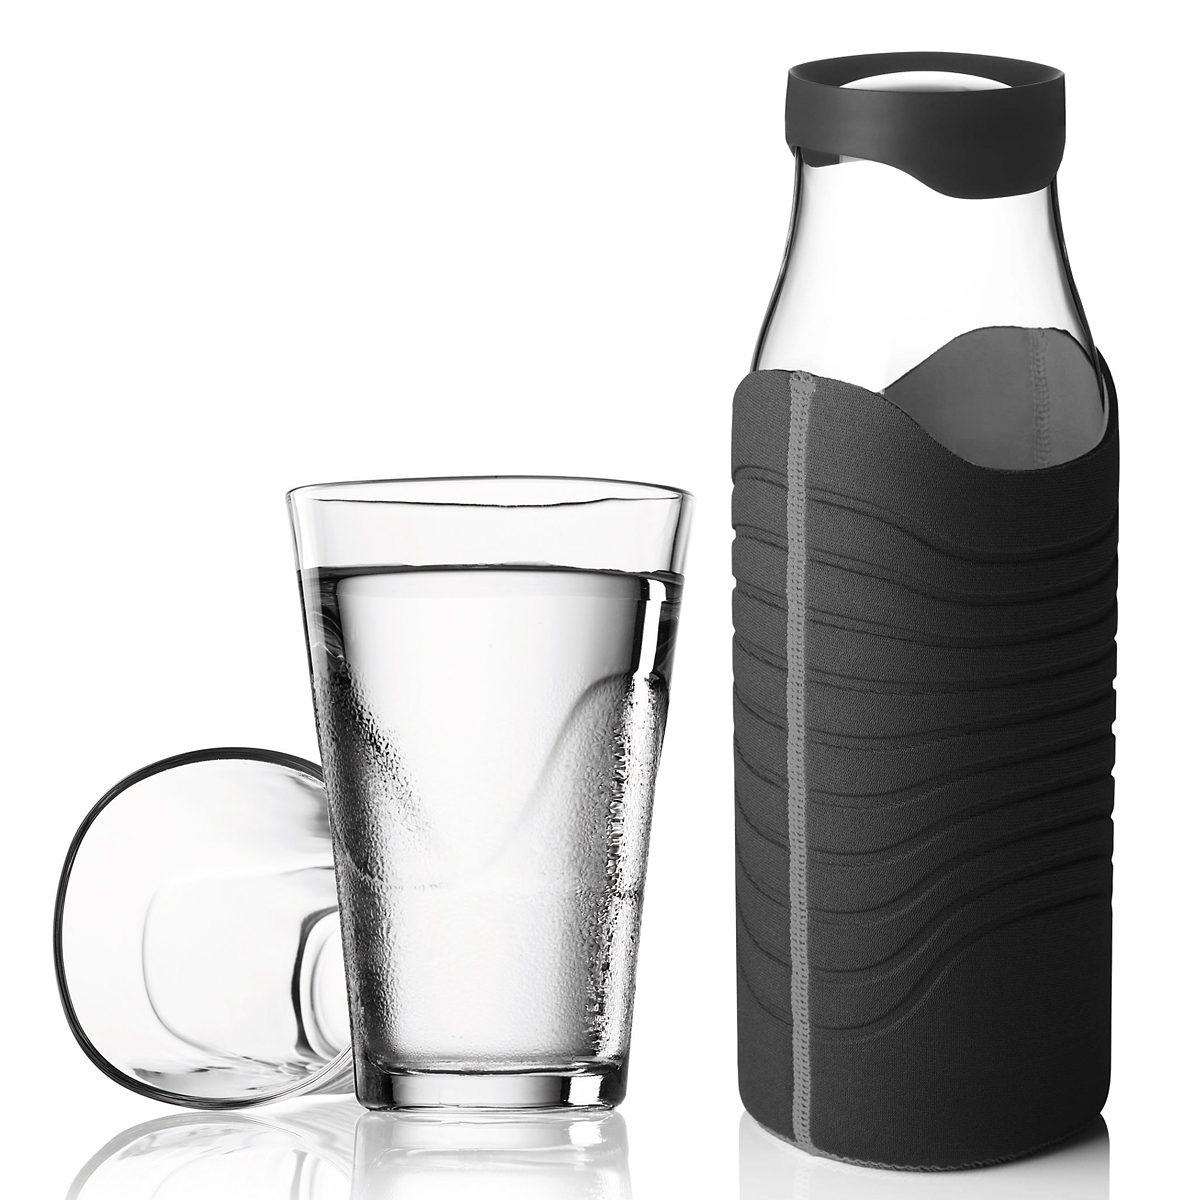 MENU Menu Karaffe 1L mit Hülle schwarz-grau plus 2 Gläser